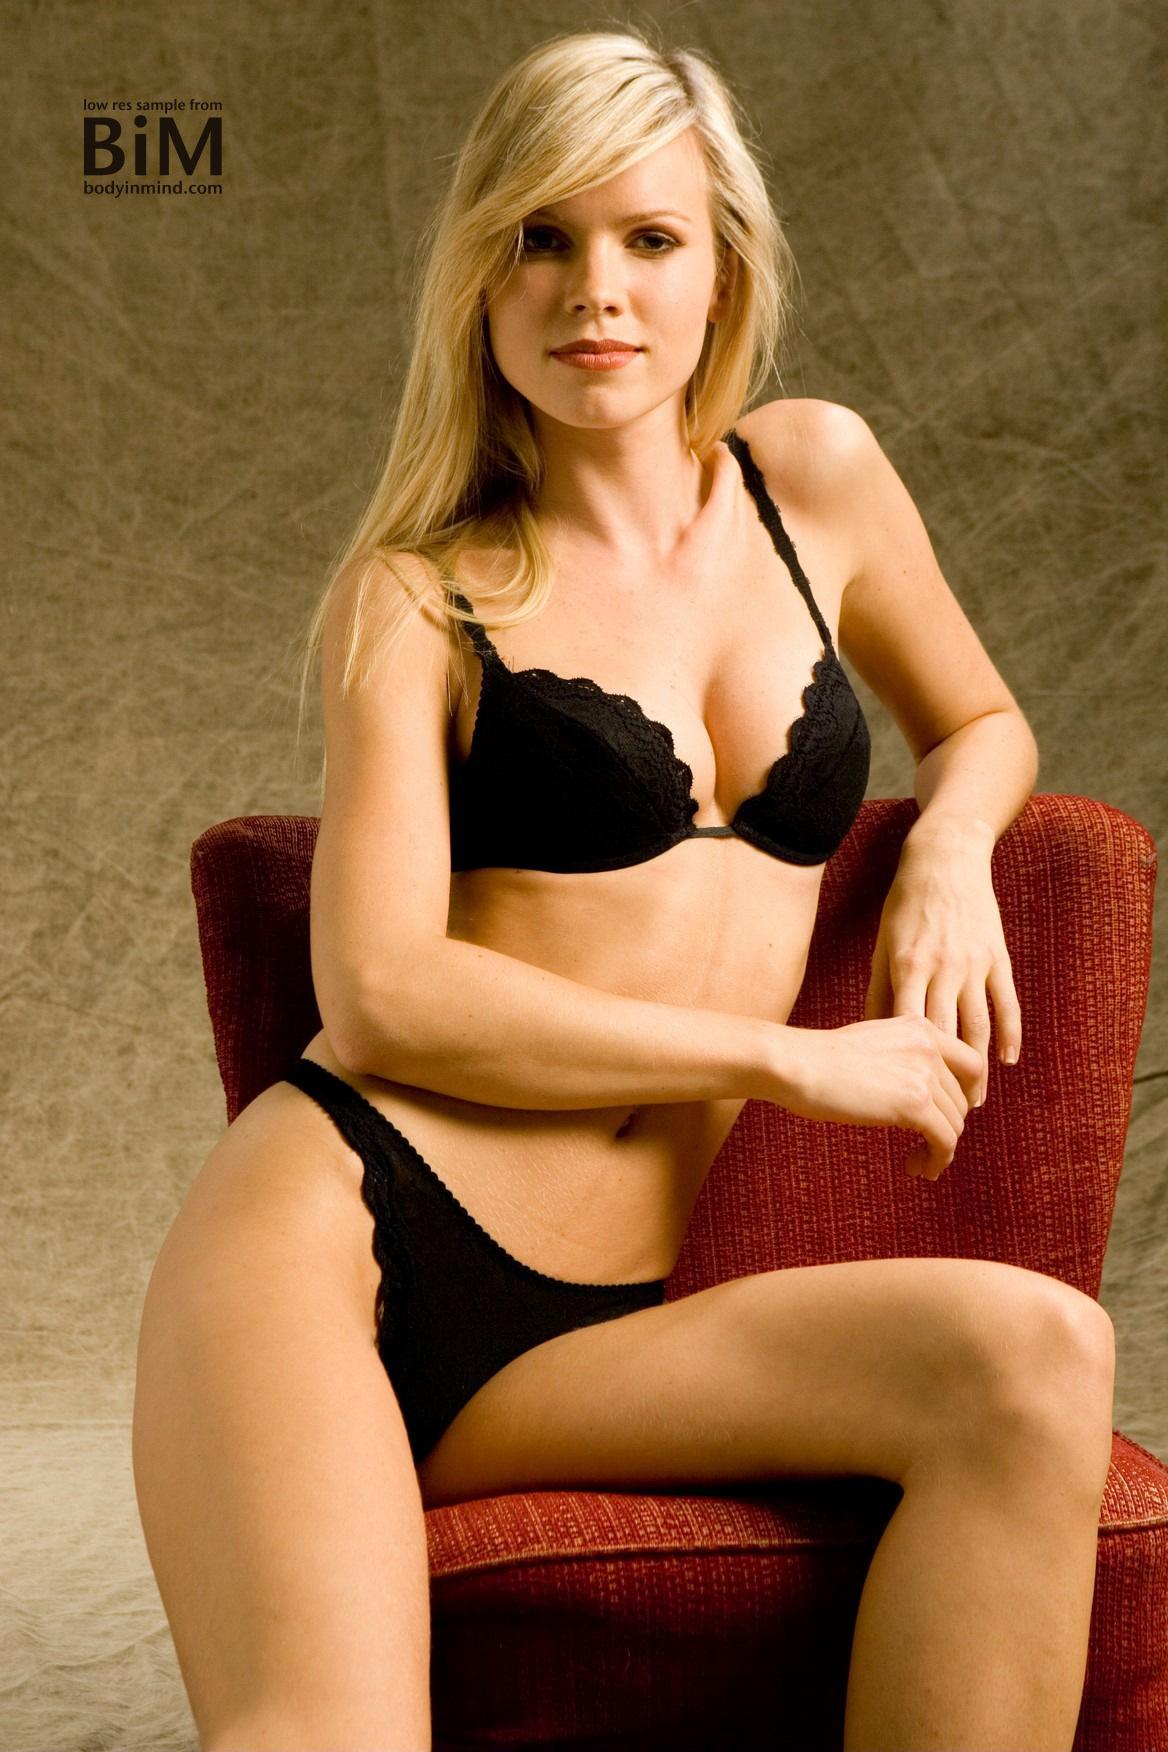 Marketa Belanoha Naked Boobs for Body in Mind